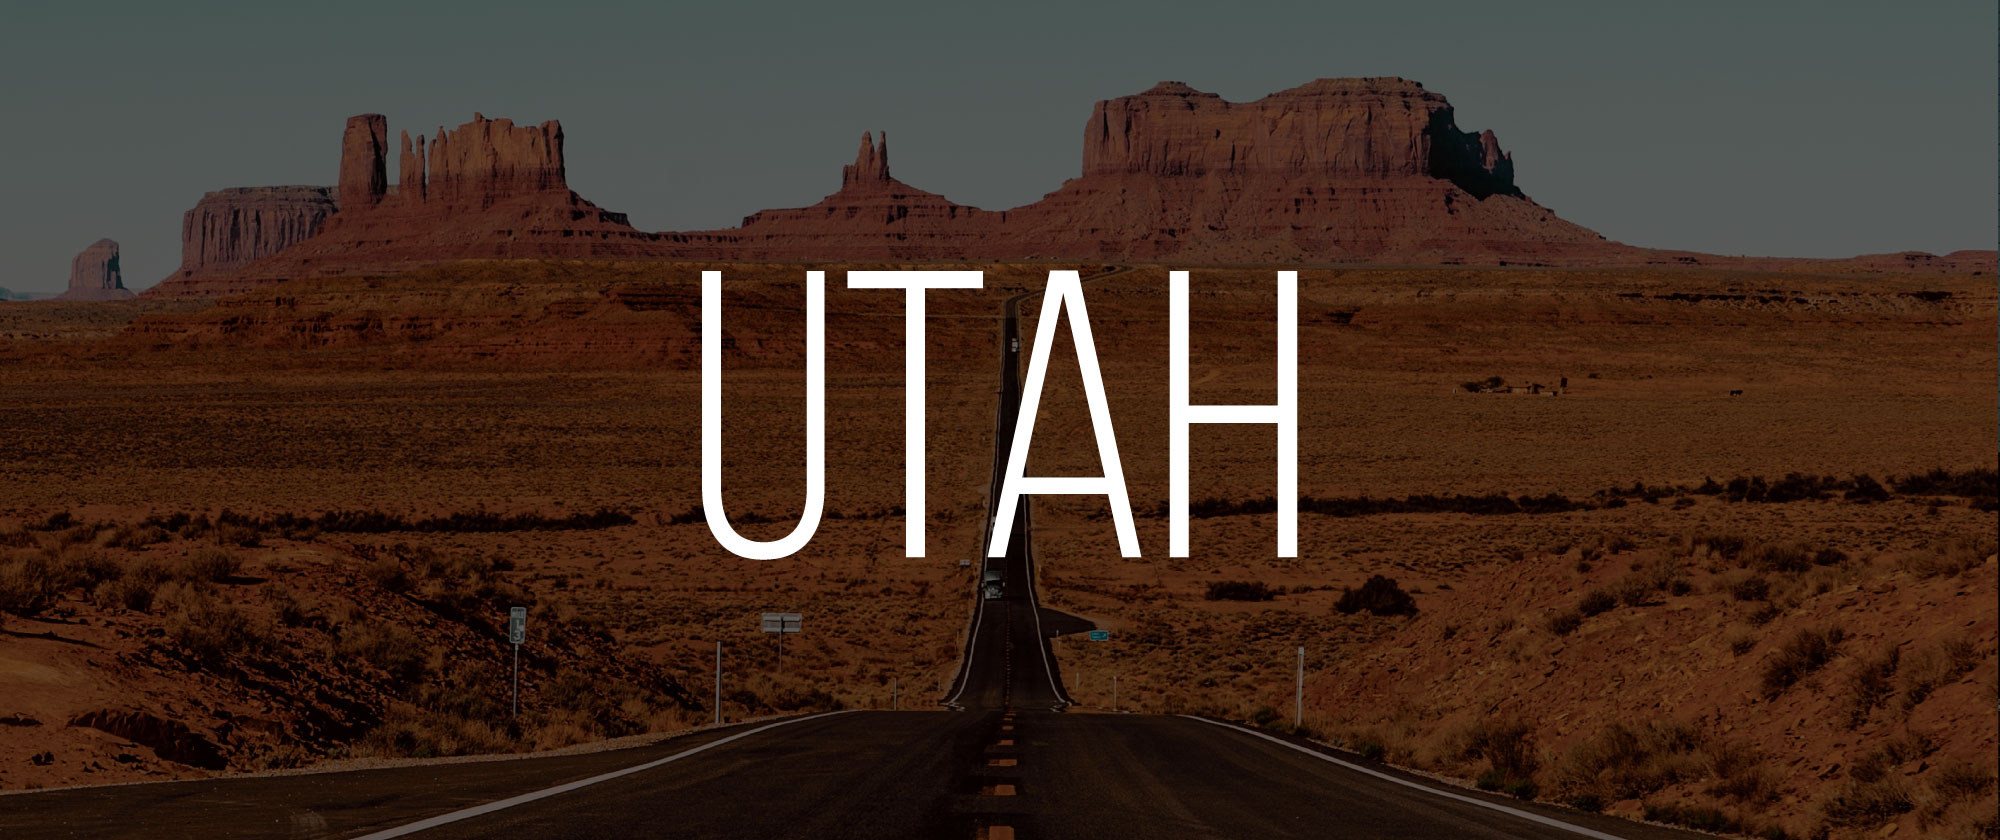 UTAH-header.jpg